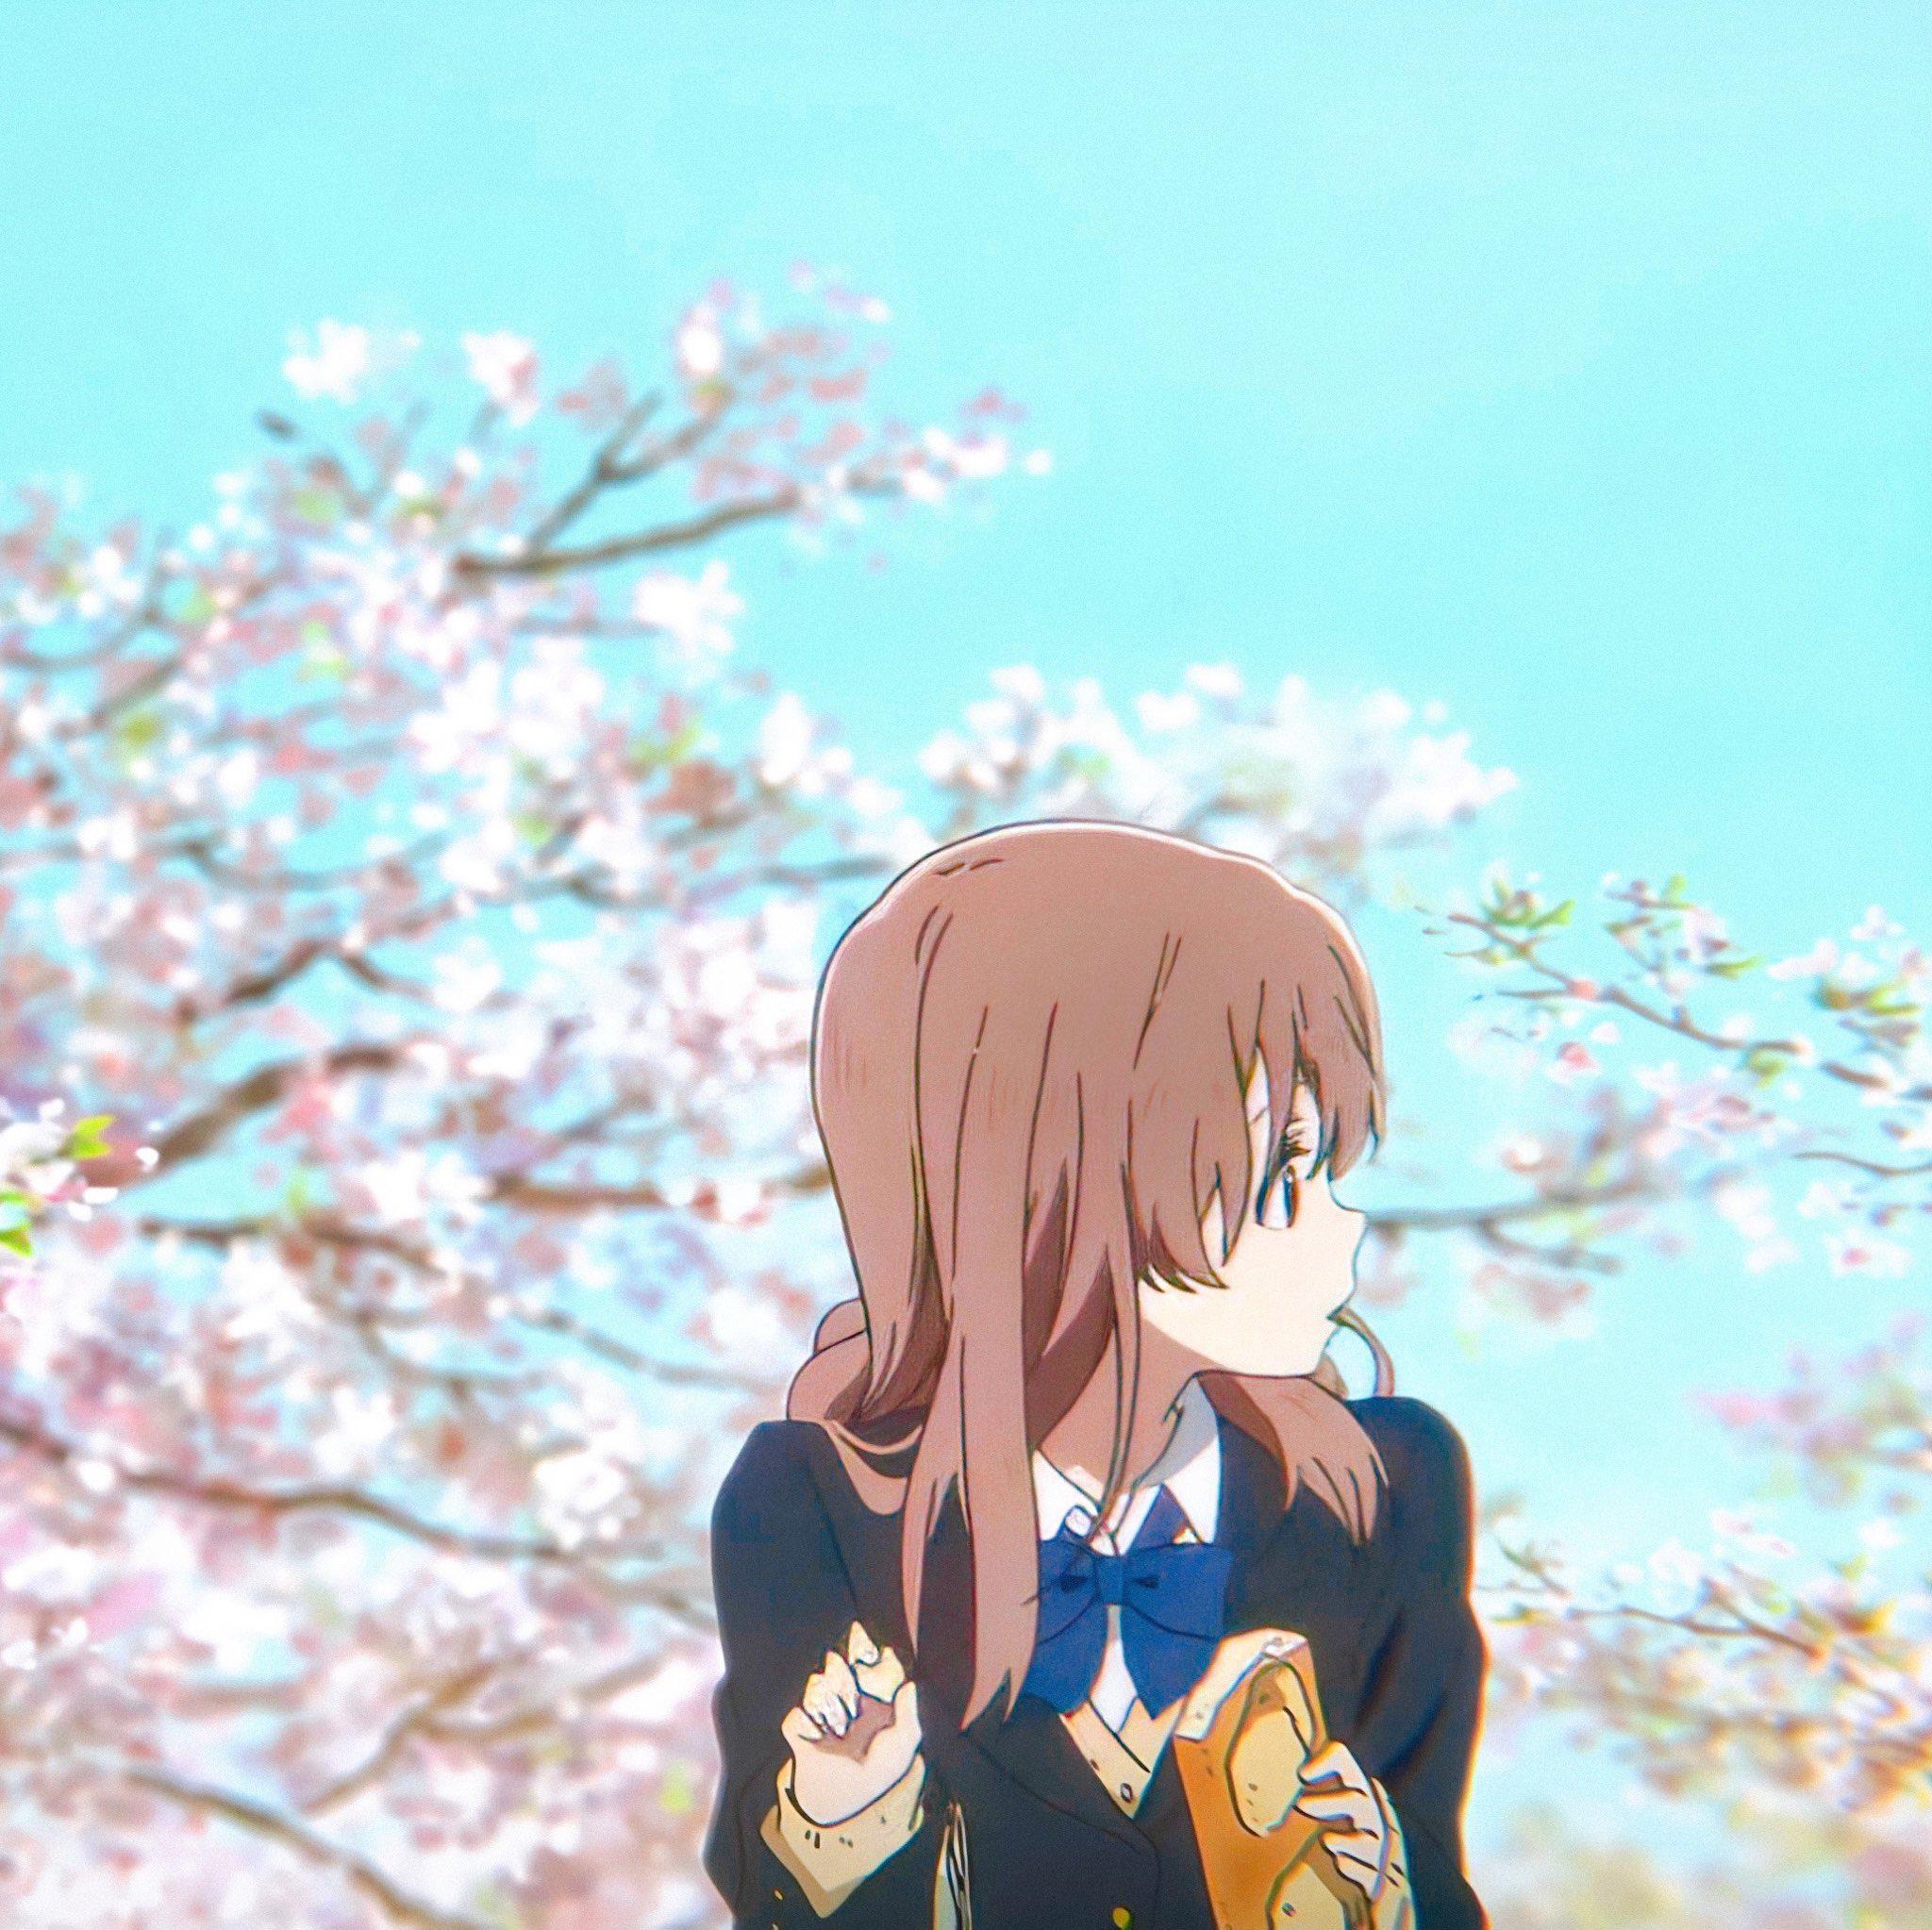 15 foto profil anime couple pp wa link mediafire part 2 youtube. Pp Anime Couple Terpisah Lengkap Terbaru Informasi Teknologi Com